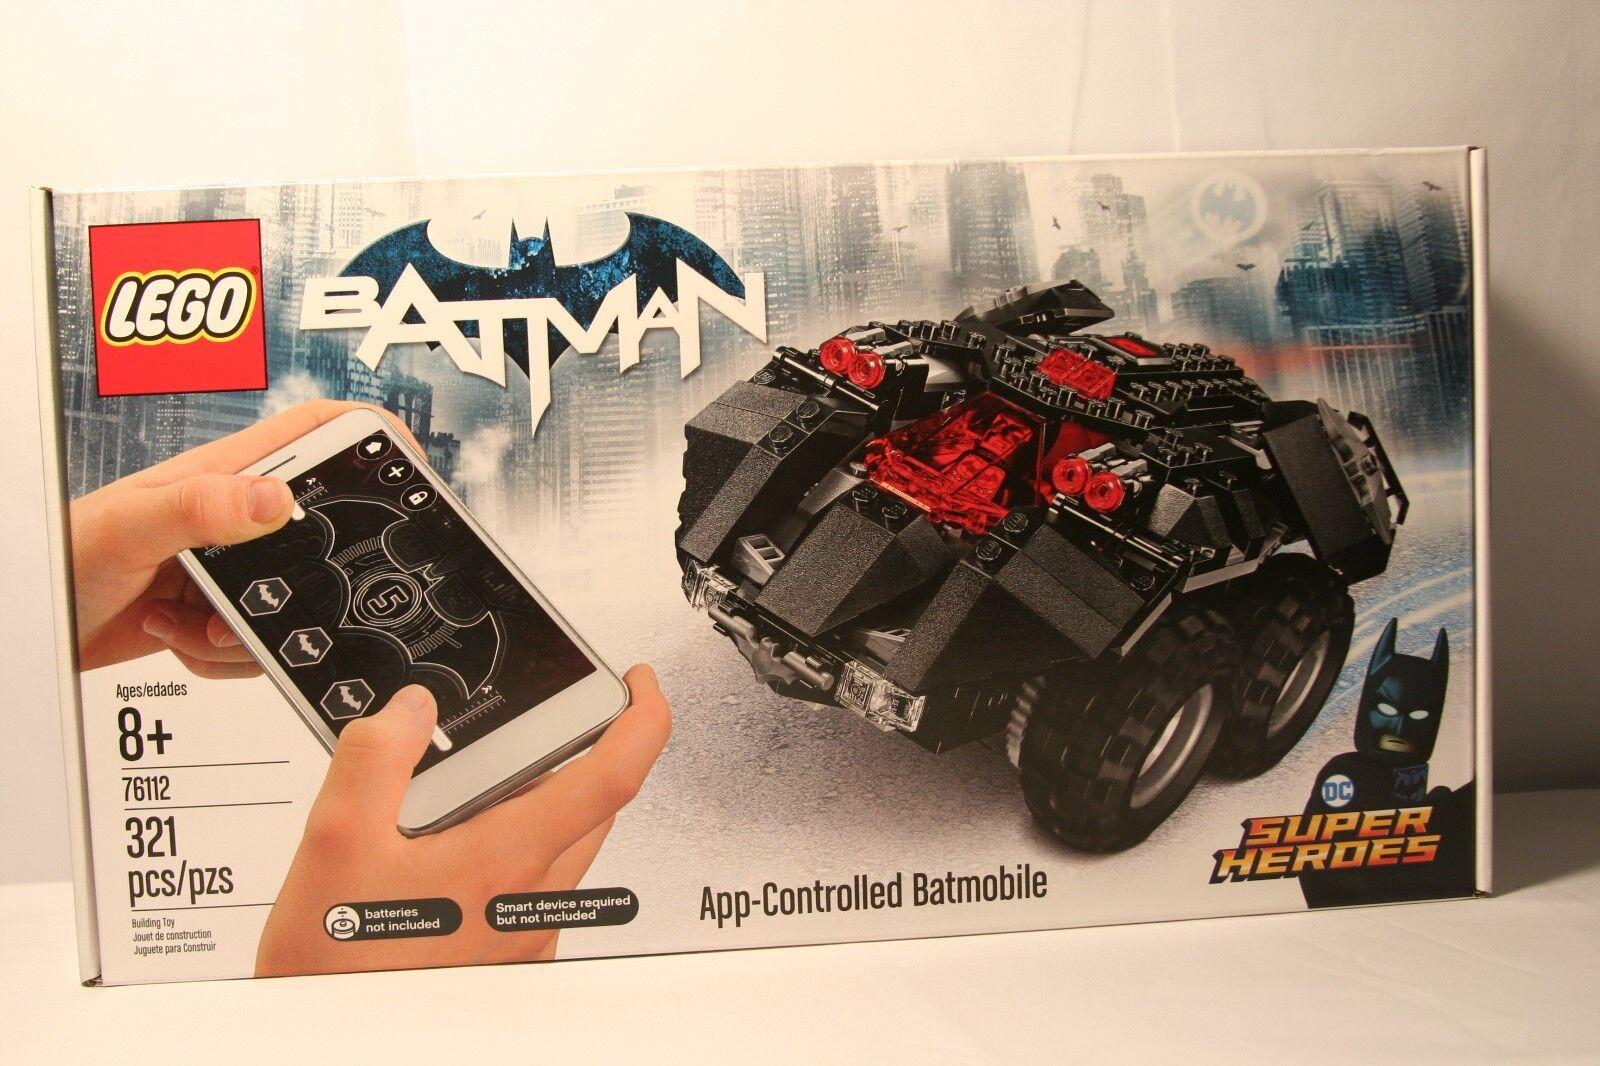 Lego DC Comics Super Heroes  App-Controlled Batmobile (76112) nuovo Sealed.  prima qualità ai consumatori